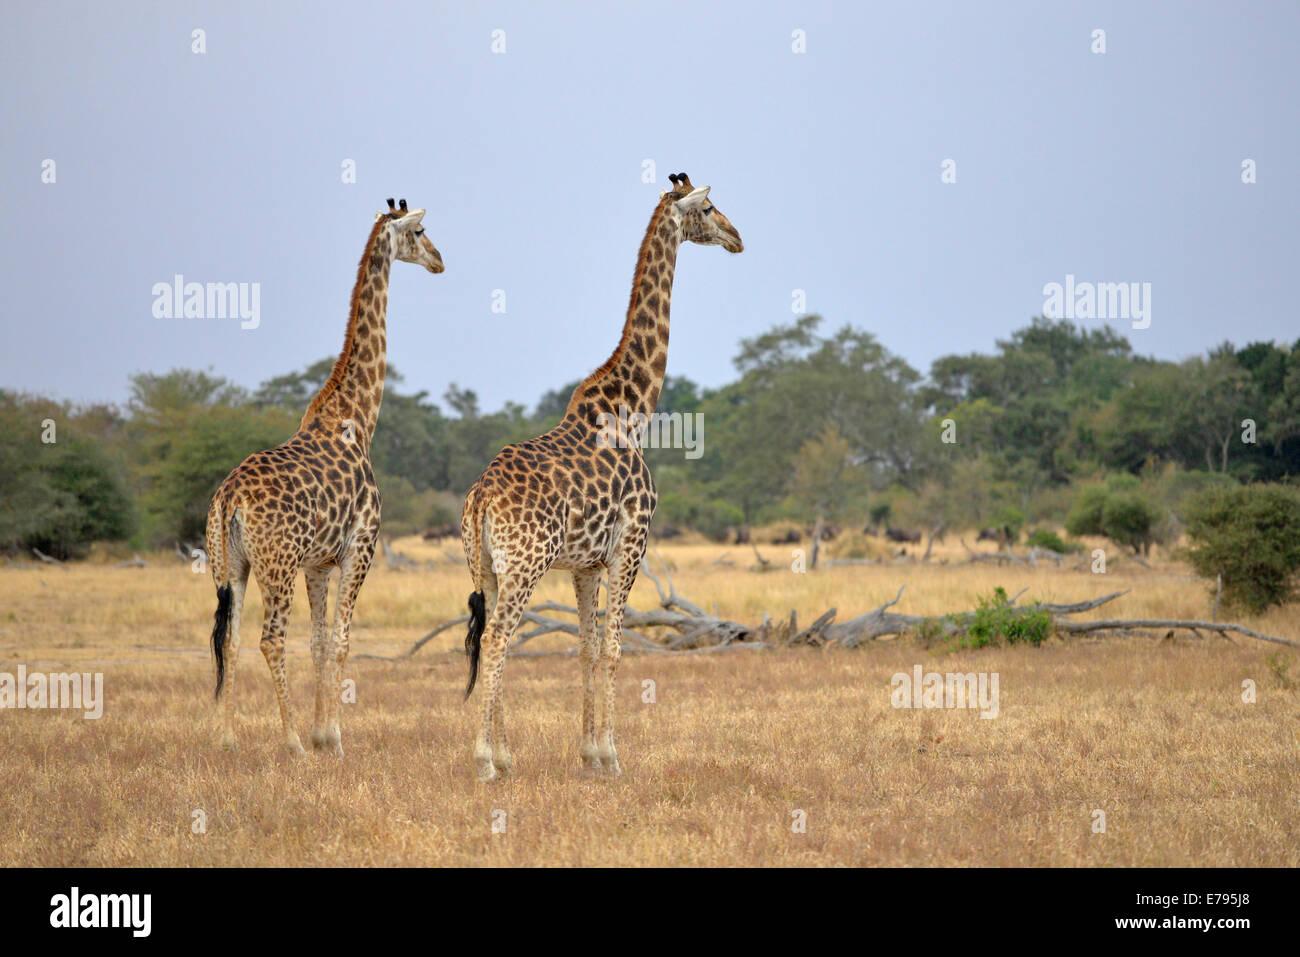 2 giraffes in open grassland savannah against skyline. Kruger National Park, South Africa - Stock Image